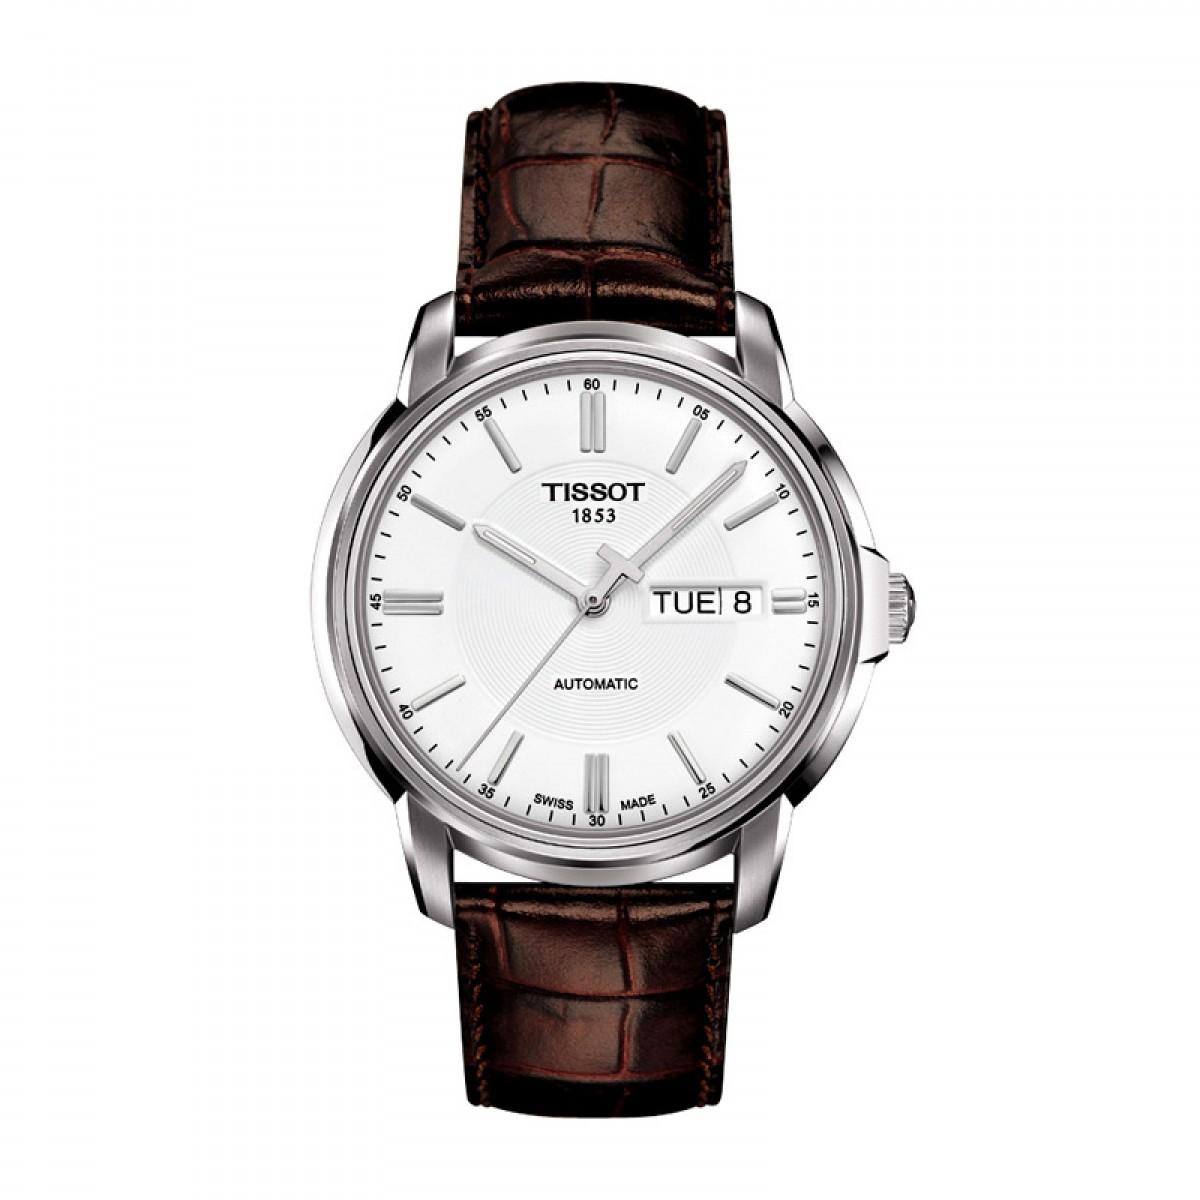 Часовник Tissot T065.430.16.031.00